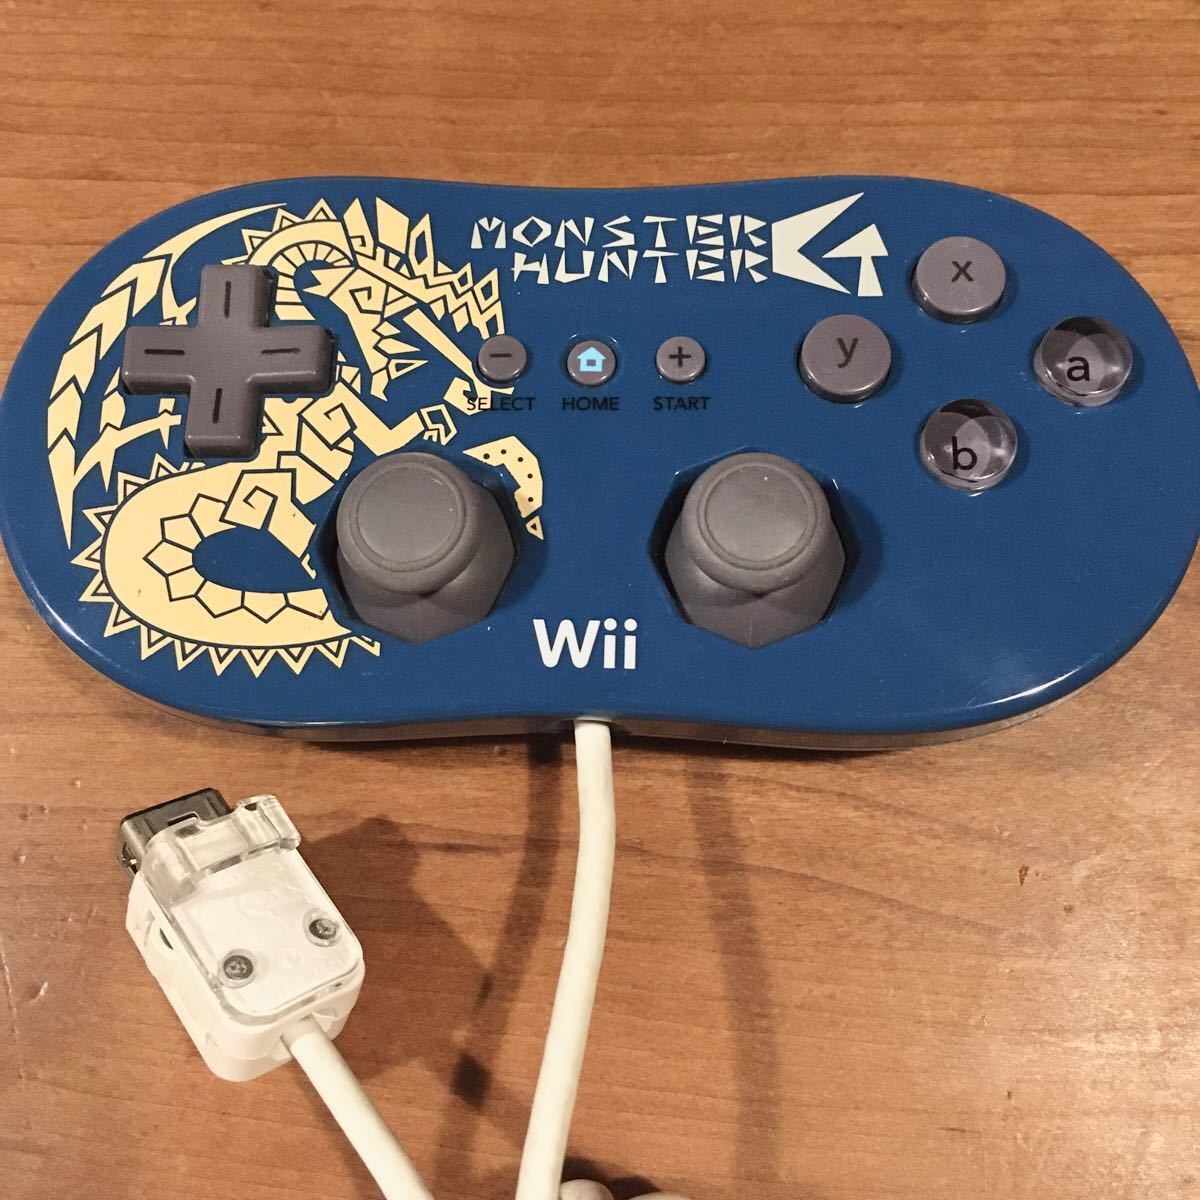 Wiiリモコン + ストラップ + Wiiハンドル + wiiコントローラー の4点セット 【送料無料】